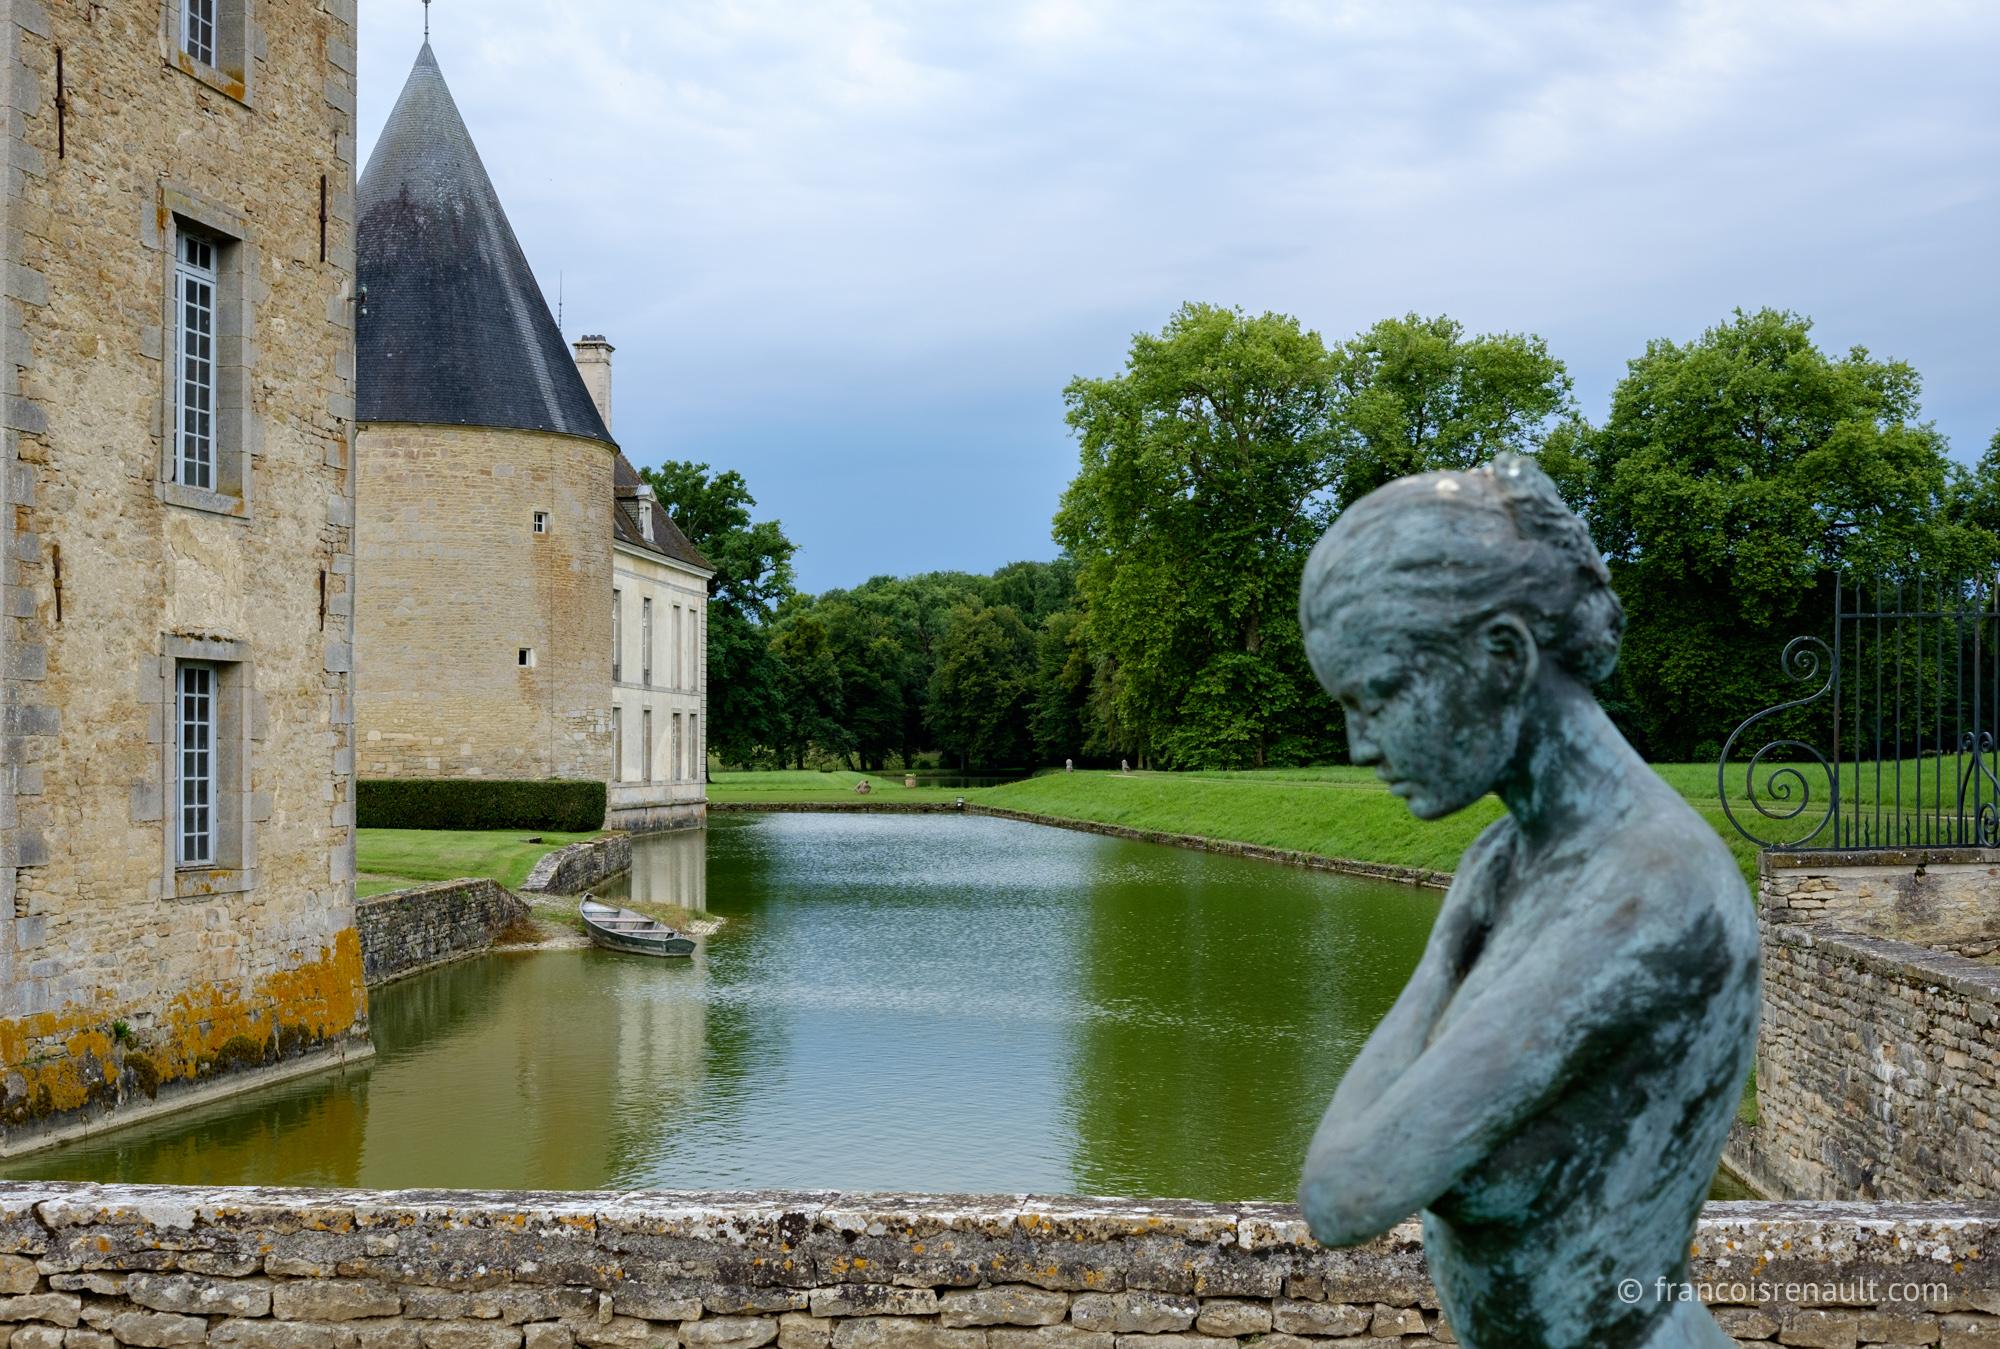 Château de Commarin,Bourgogne, France.